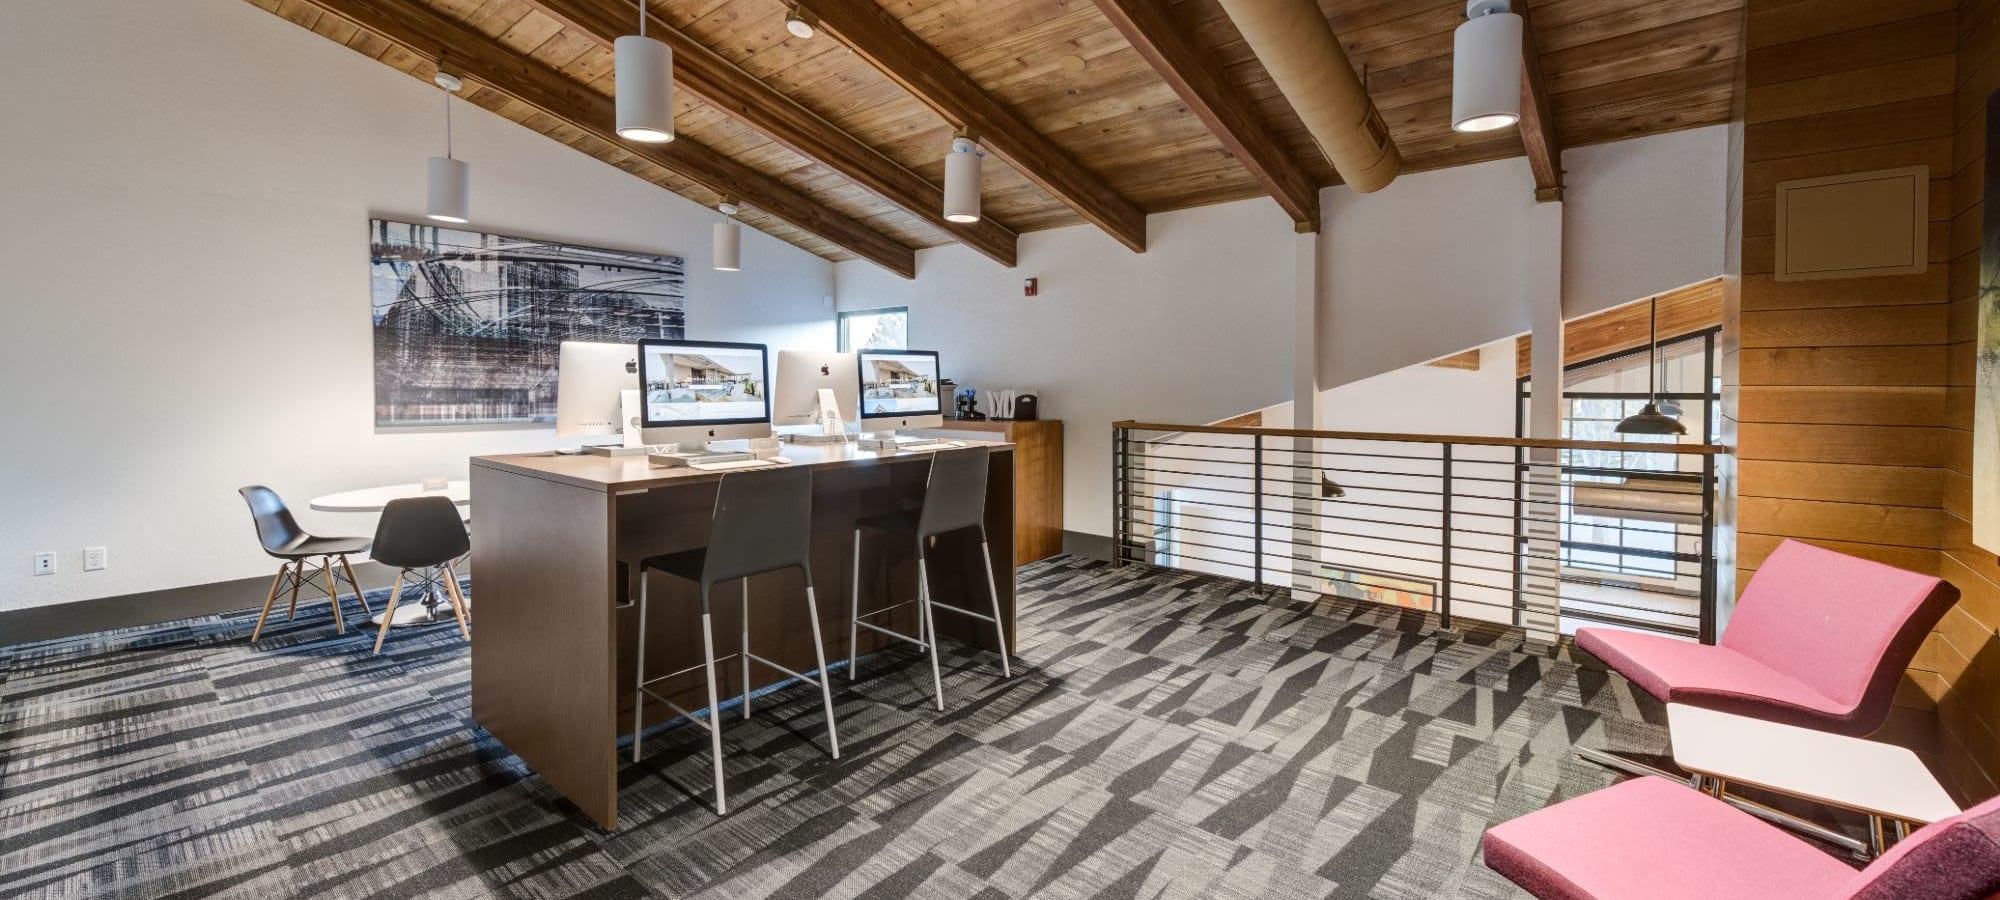 Schedule a tour of Ashford Belmar in Lakewood, Colorado